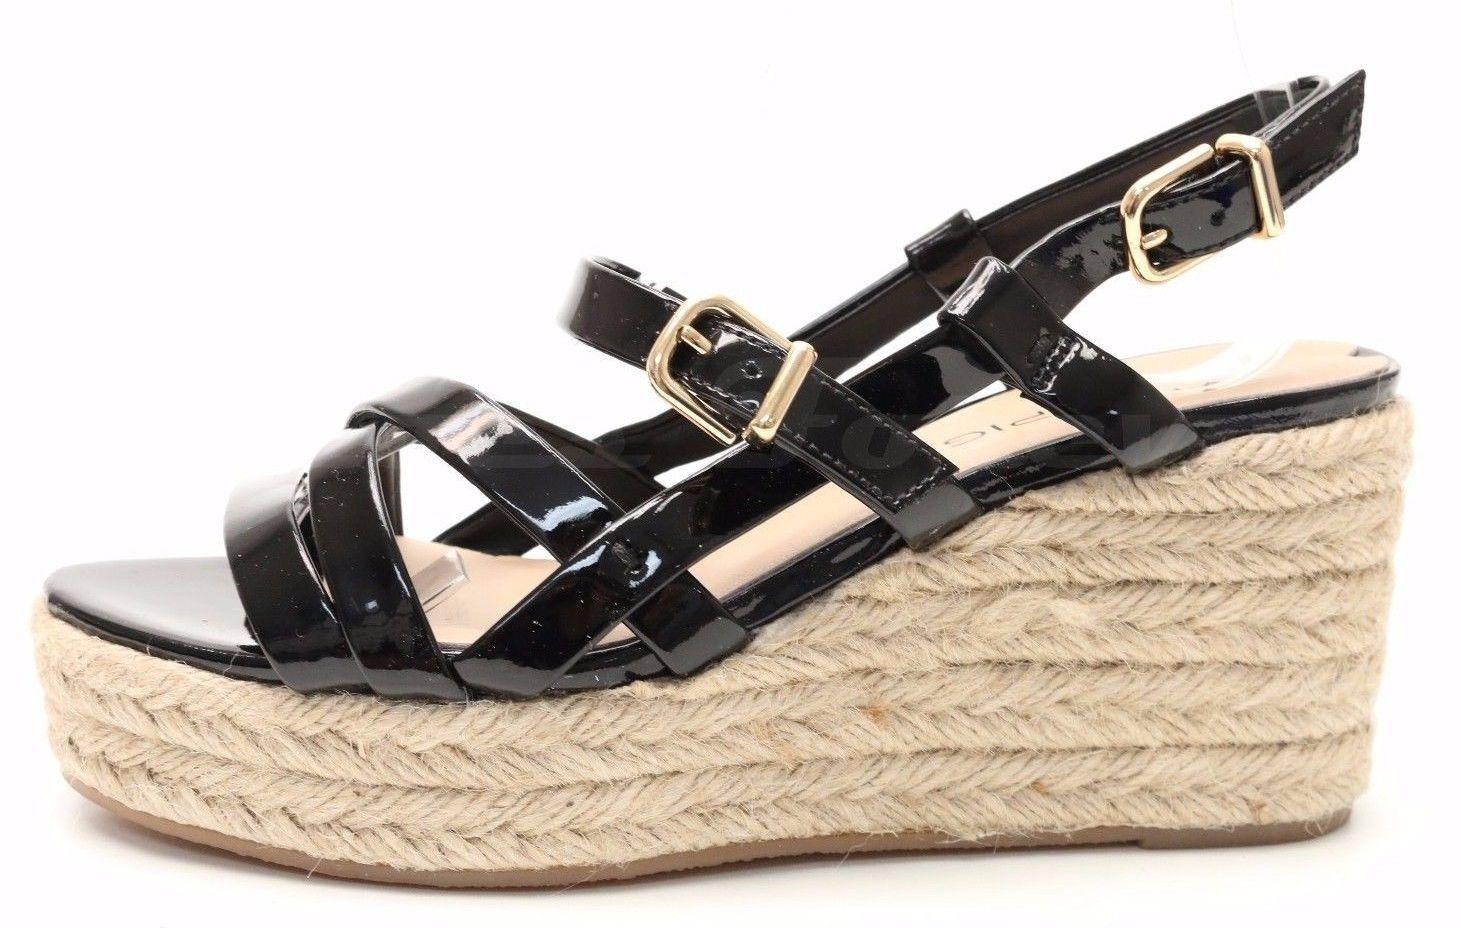 225 VIA SPIGA black patent leather wedge slingback sandals sz. 5 (EU 39) NEW